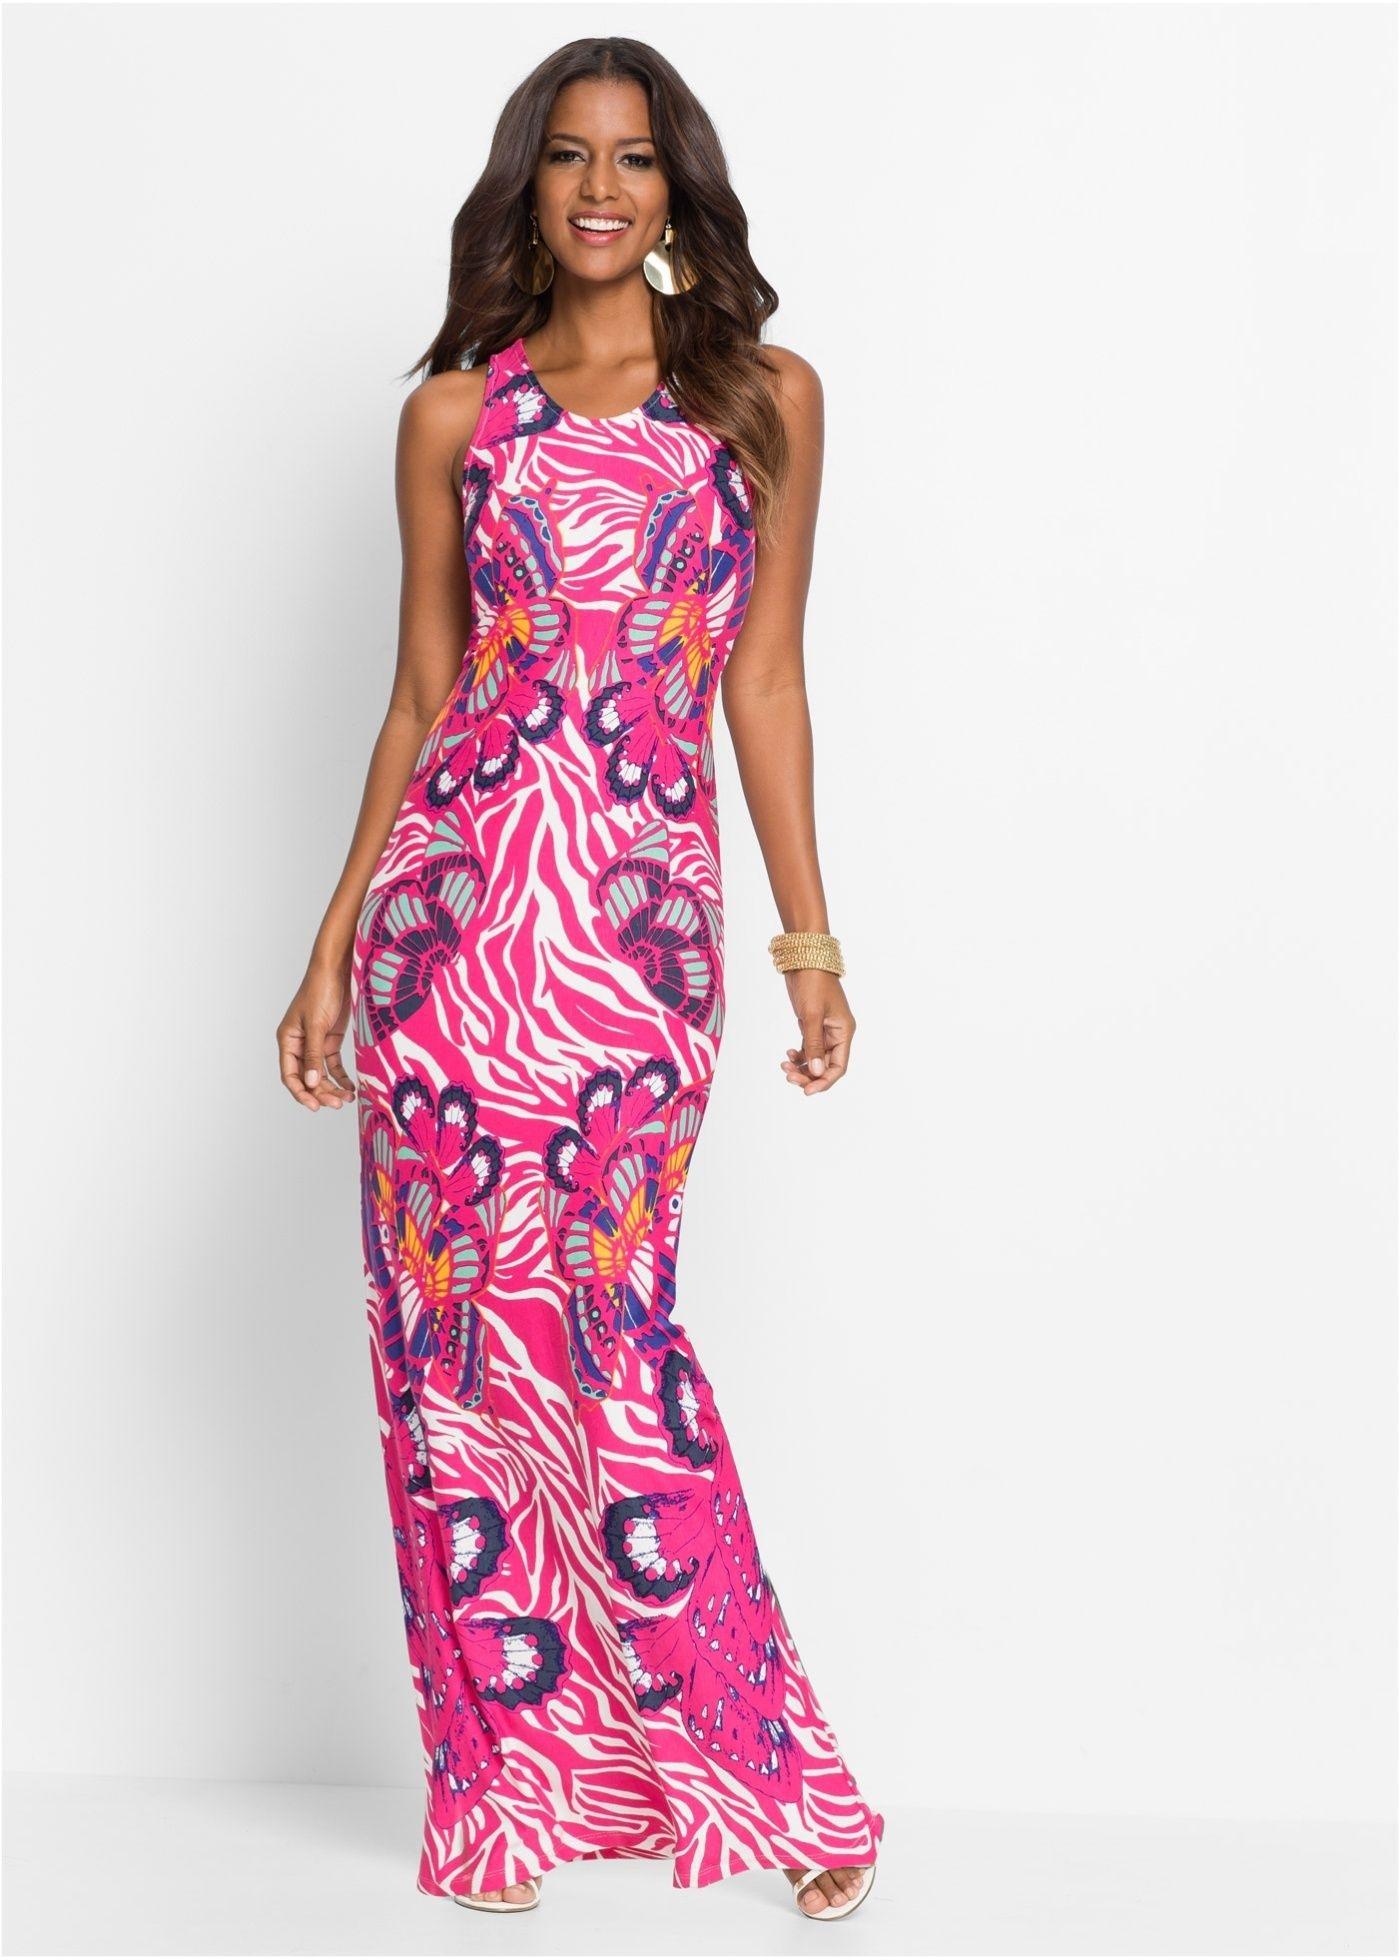 13 Top Kleid Bunt ÄrmelAbend Luxurius Kleid Bunt Vertrieb